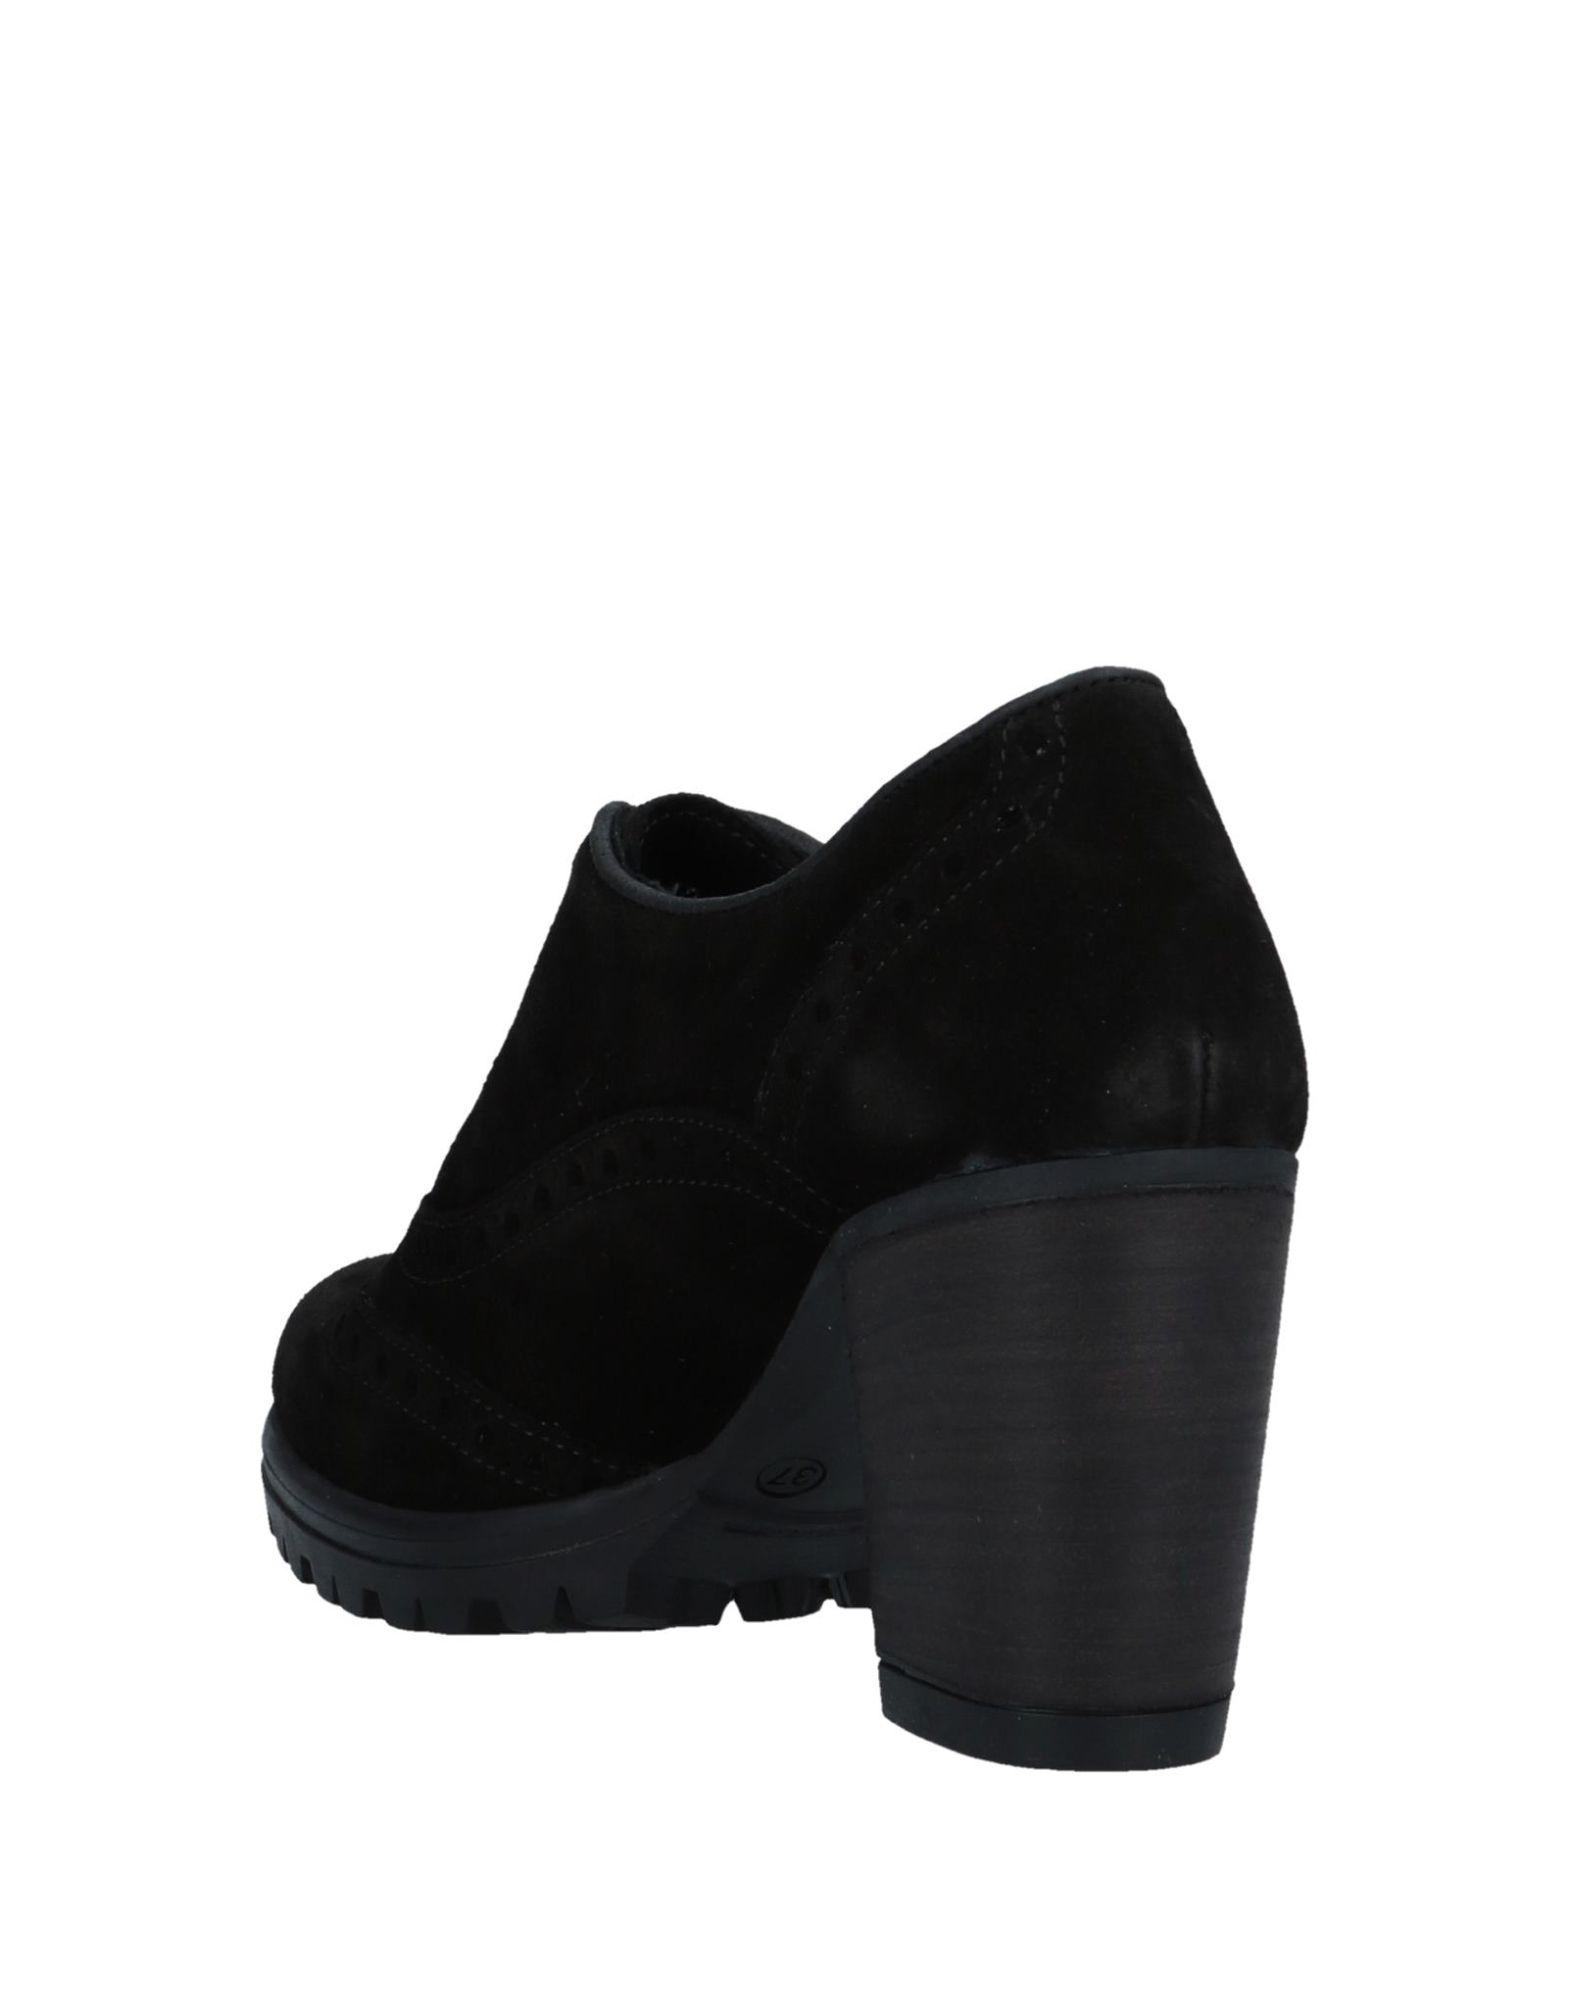 Antica Cuoieria Schnürschuhe Damen  11553989CE Gute Qualität beliebte Schuhe